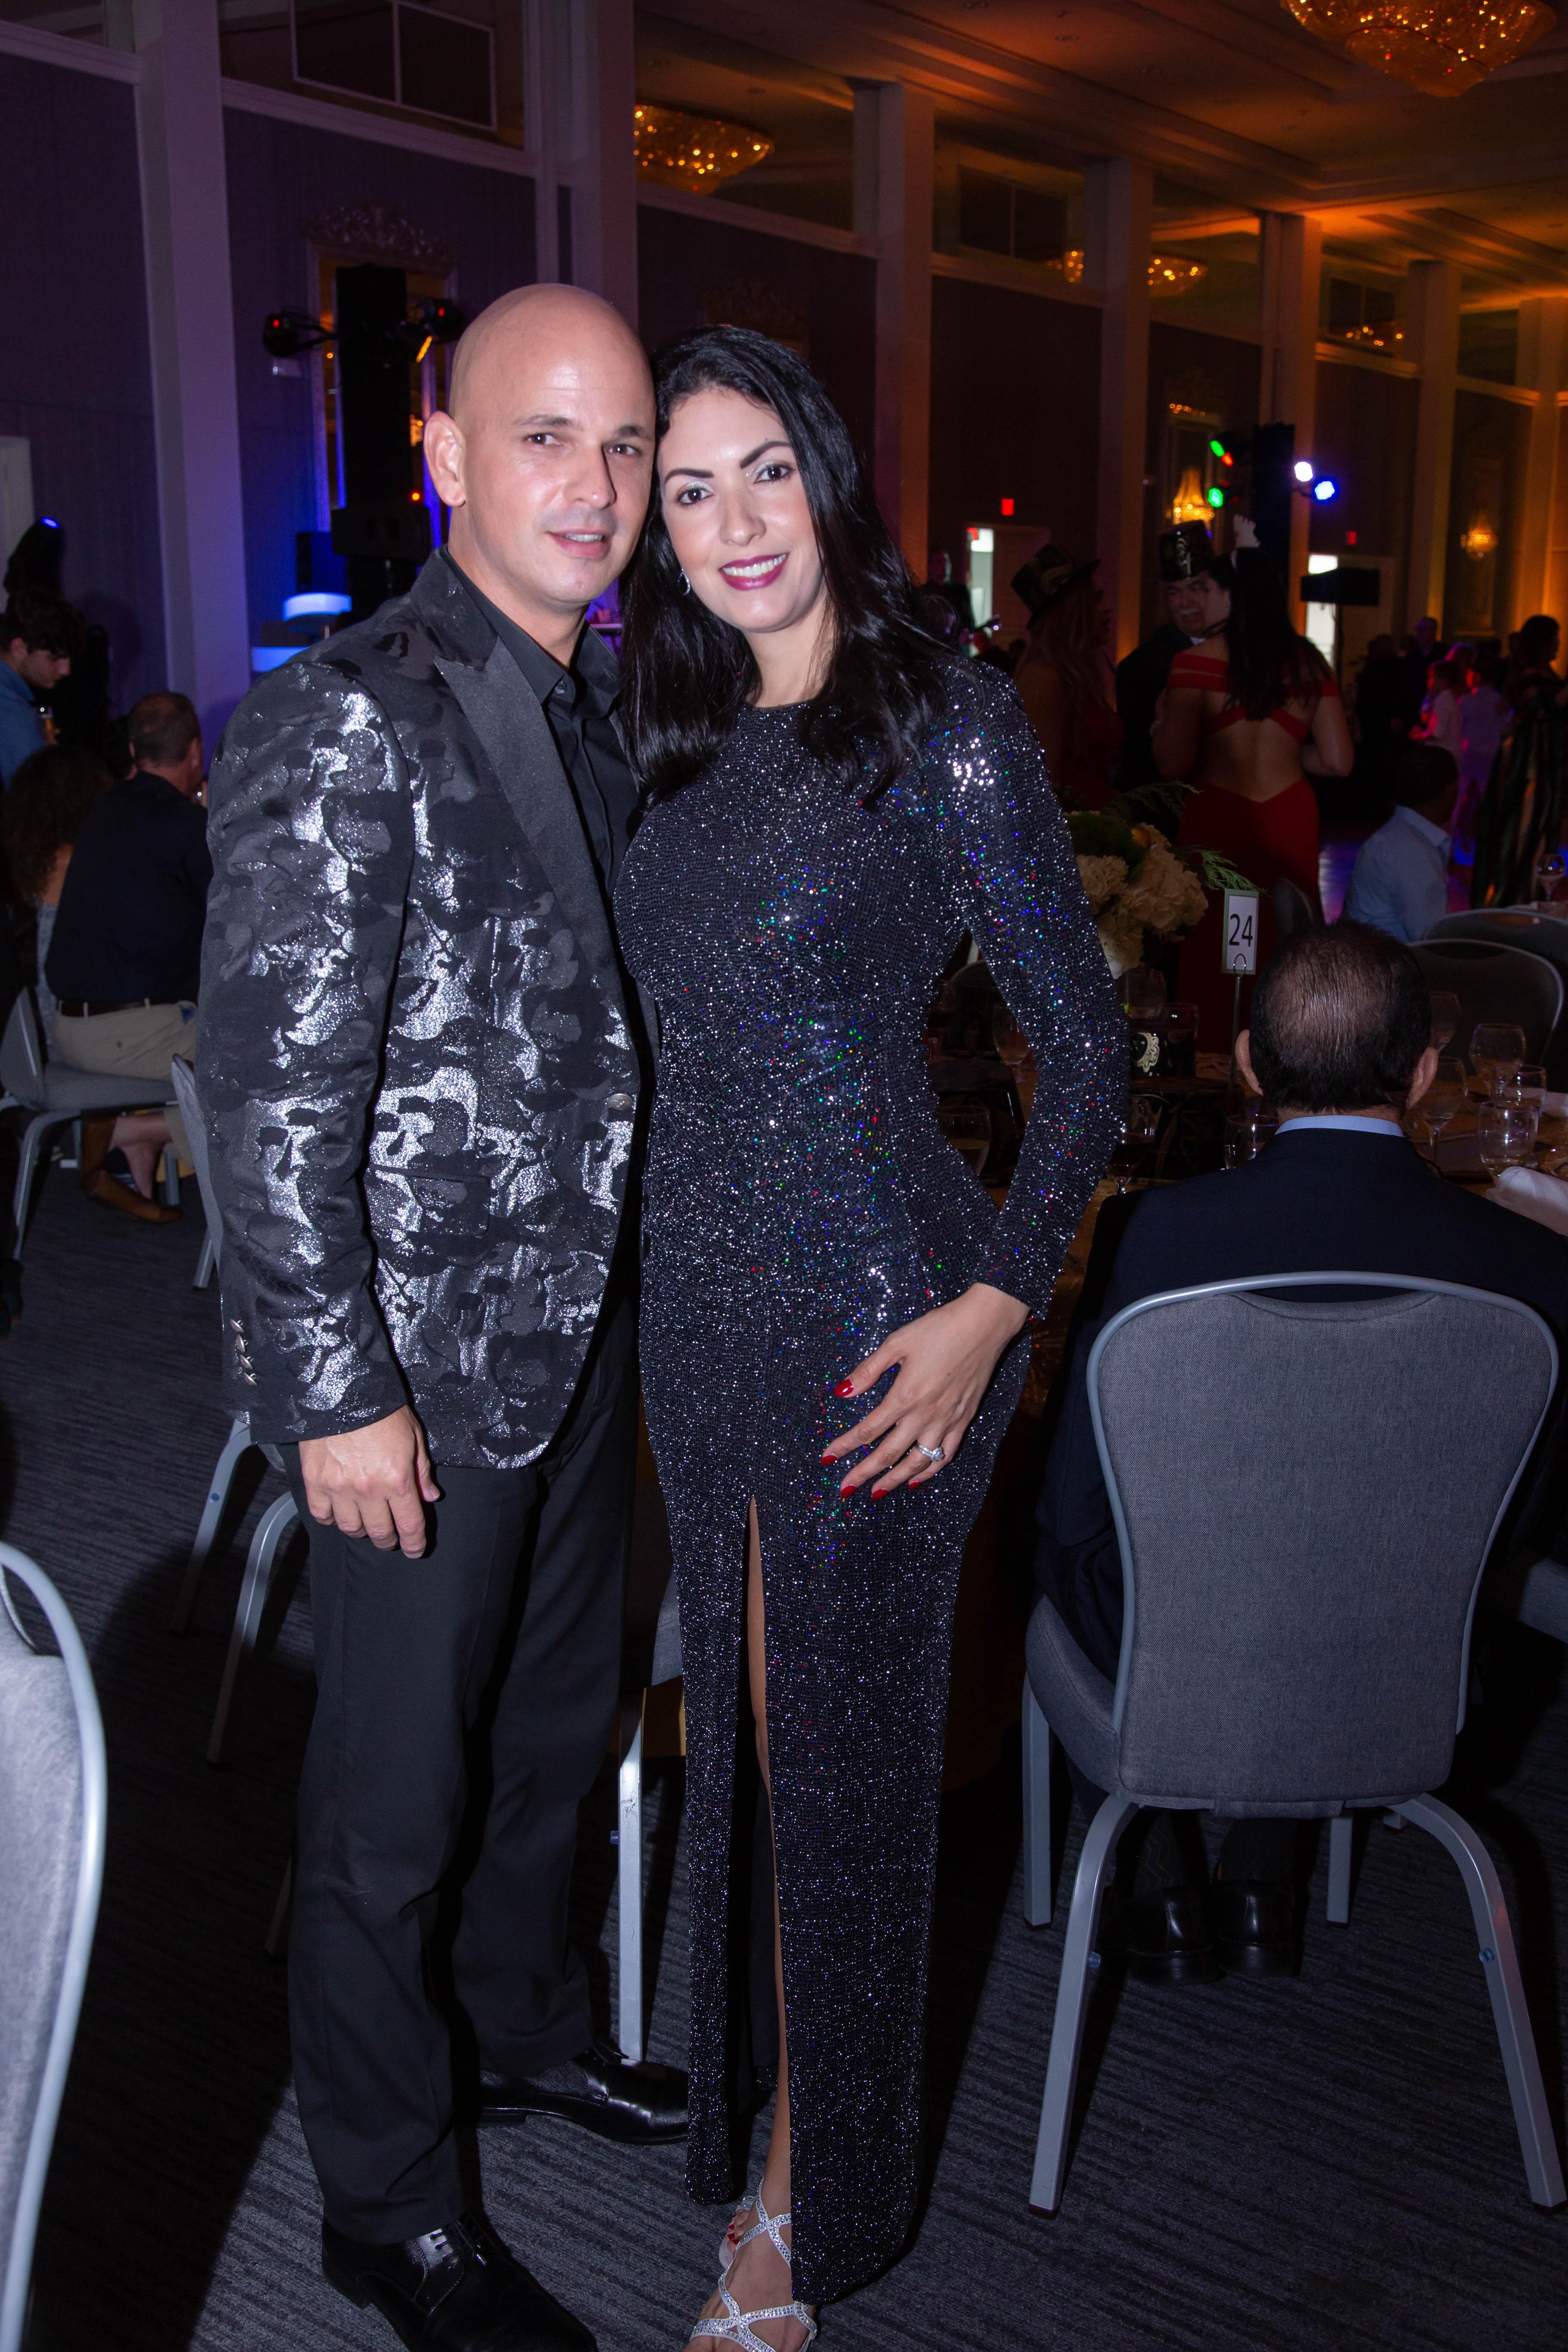 Carlos Báez y Limarys Valentín. (Suministrada)